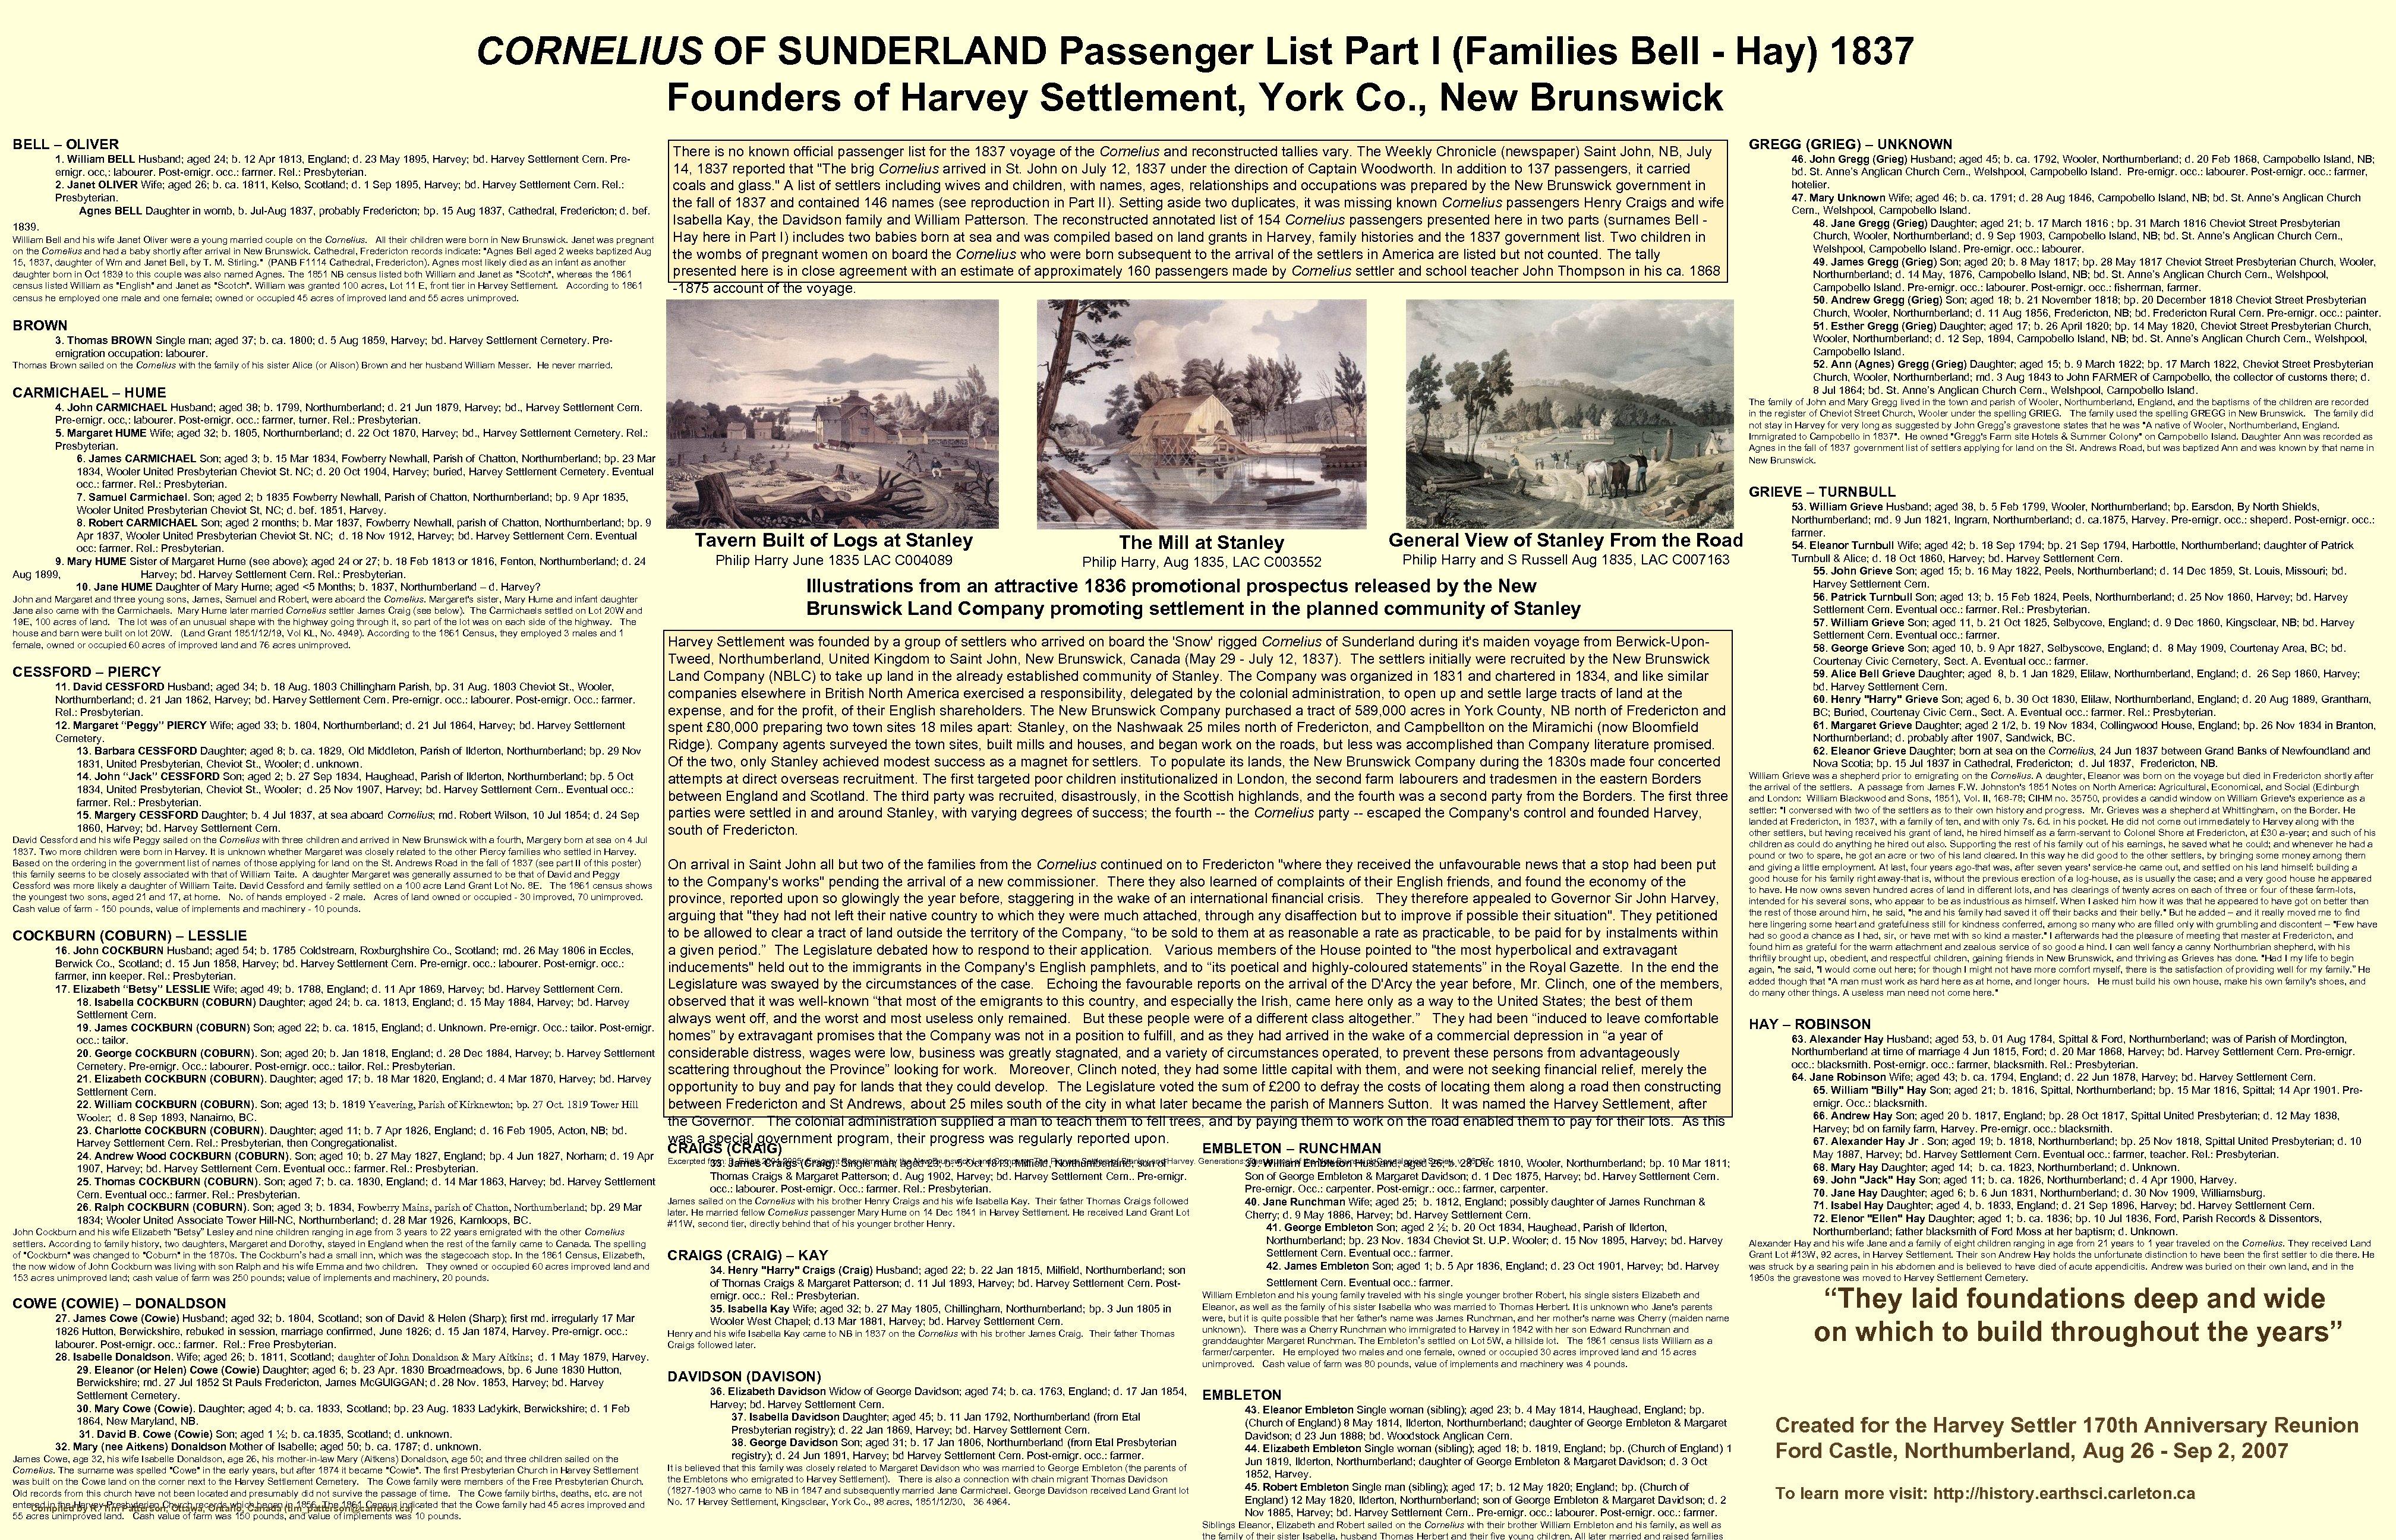 CORNELIUS OF SUNDERLAND Passenger List Part I (Families Bell - Hay) 1837 Founders of